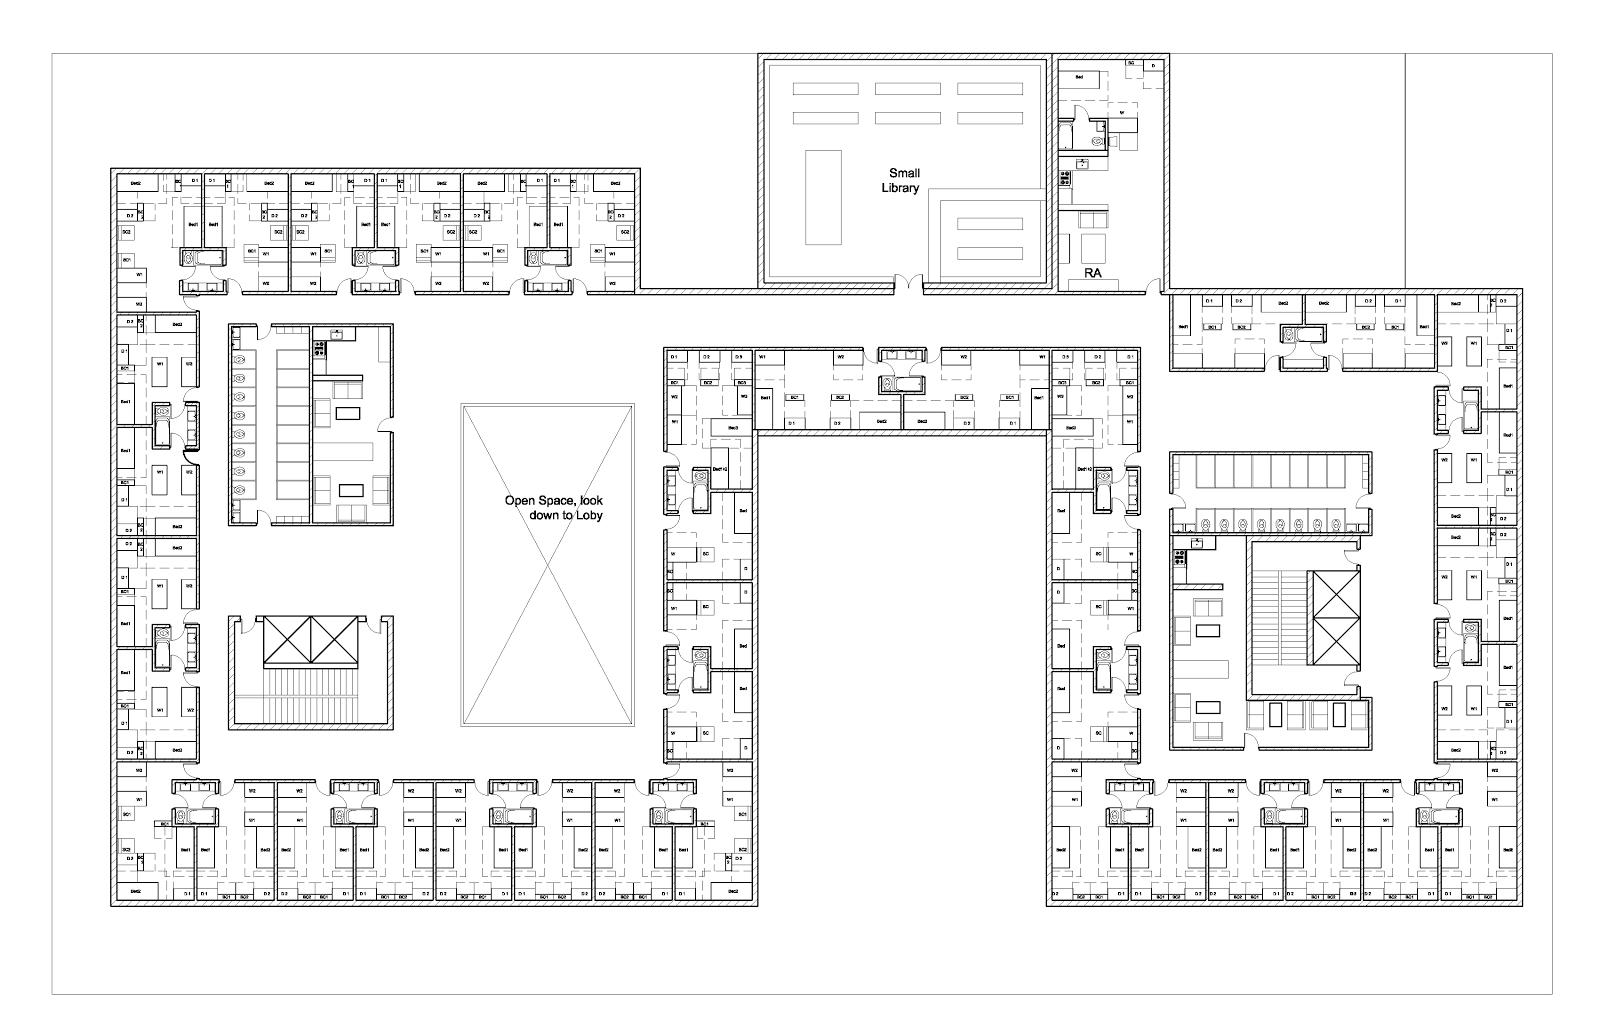 Arch3611f12trungnguyen floor plan continue for Floor layout planner